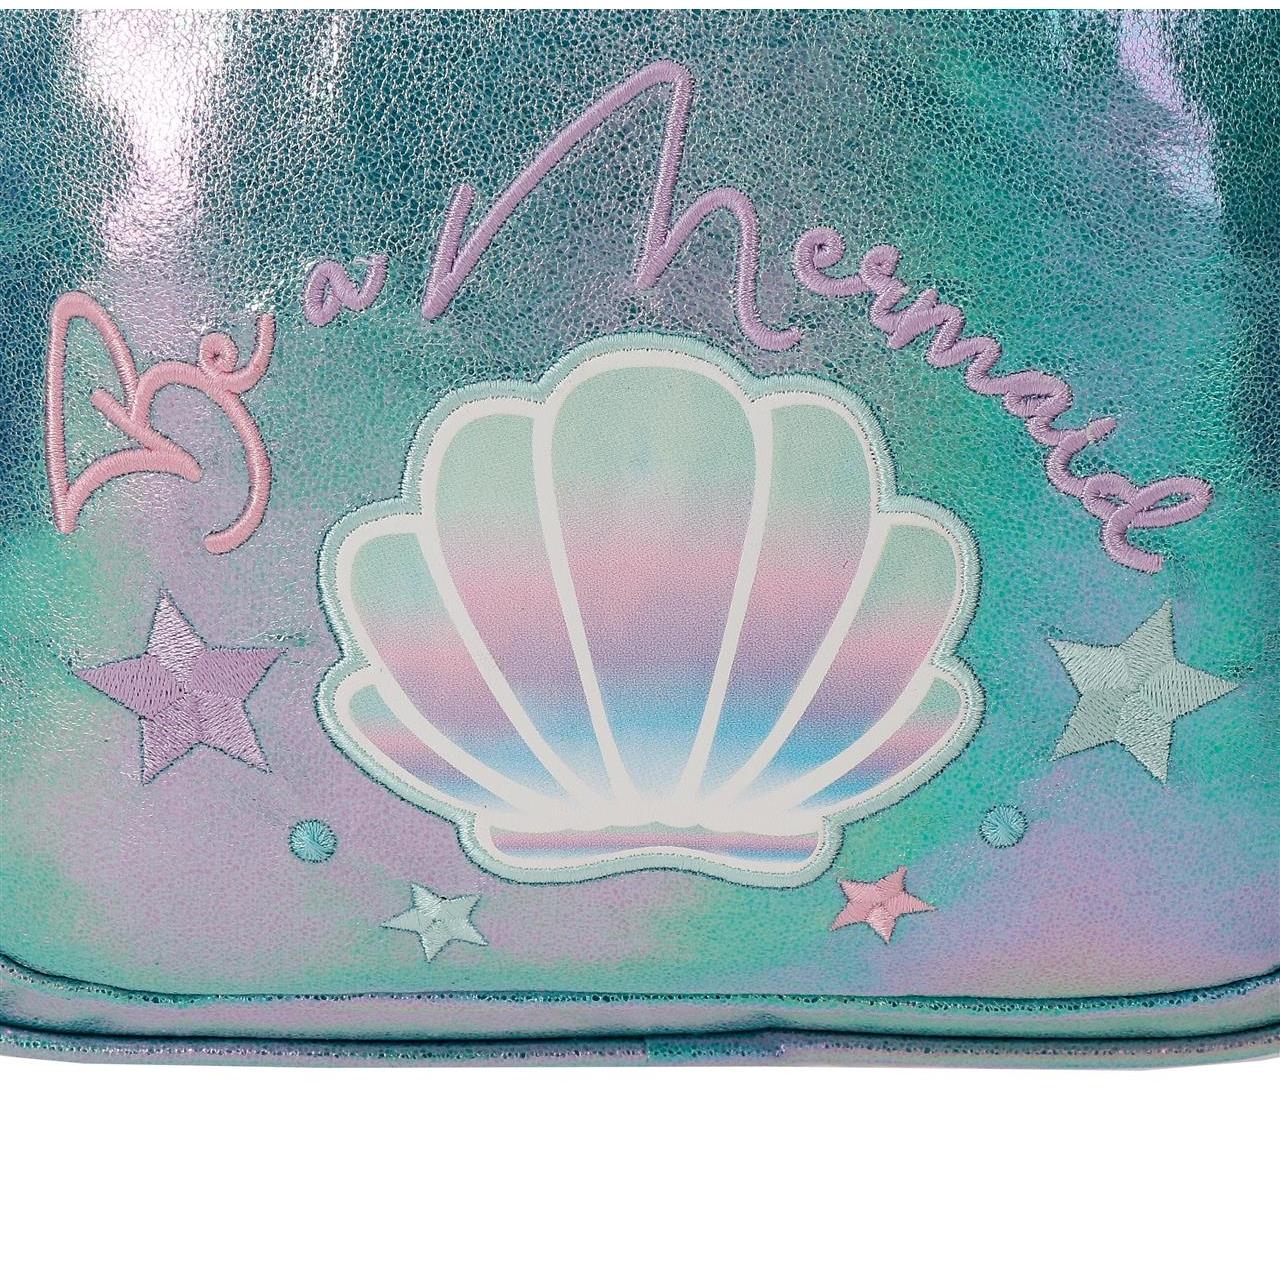 Mochila Enso Be a Mermaid Doble Compartimento